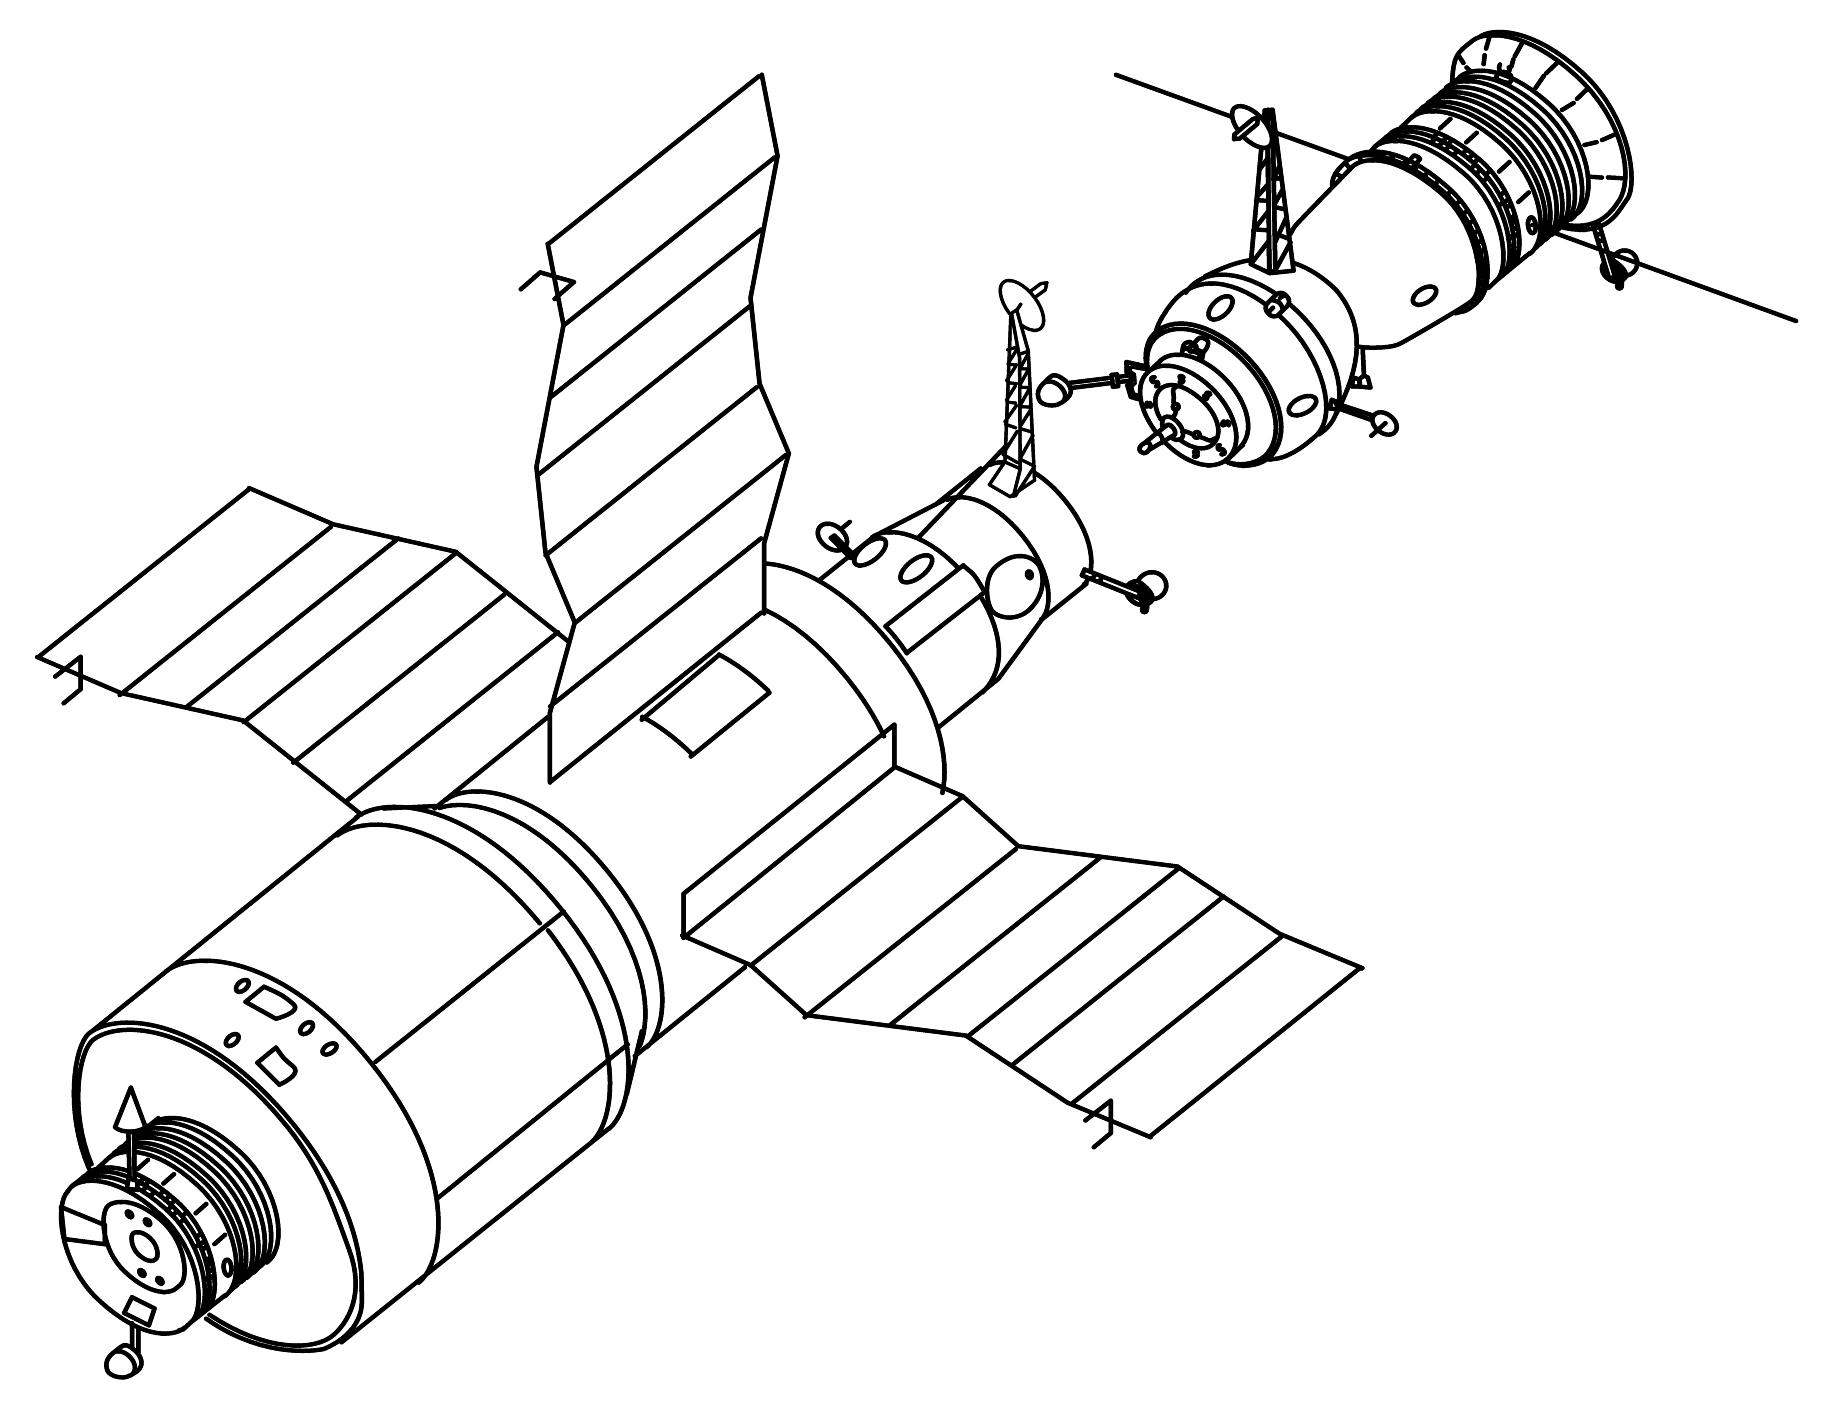 Fichier Salyut 4 And Soyuz Drawing